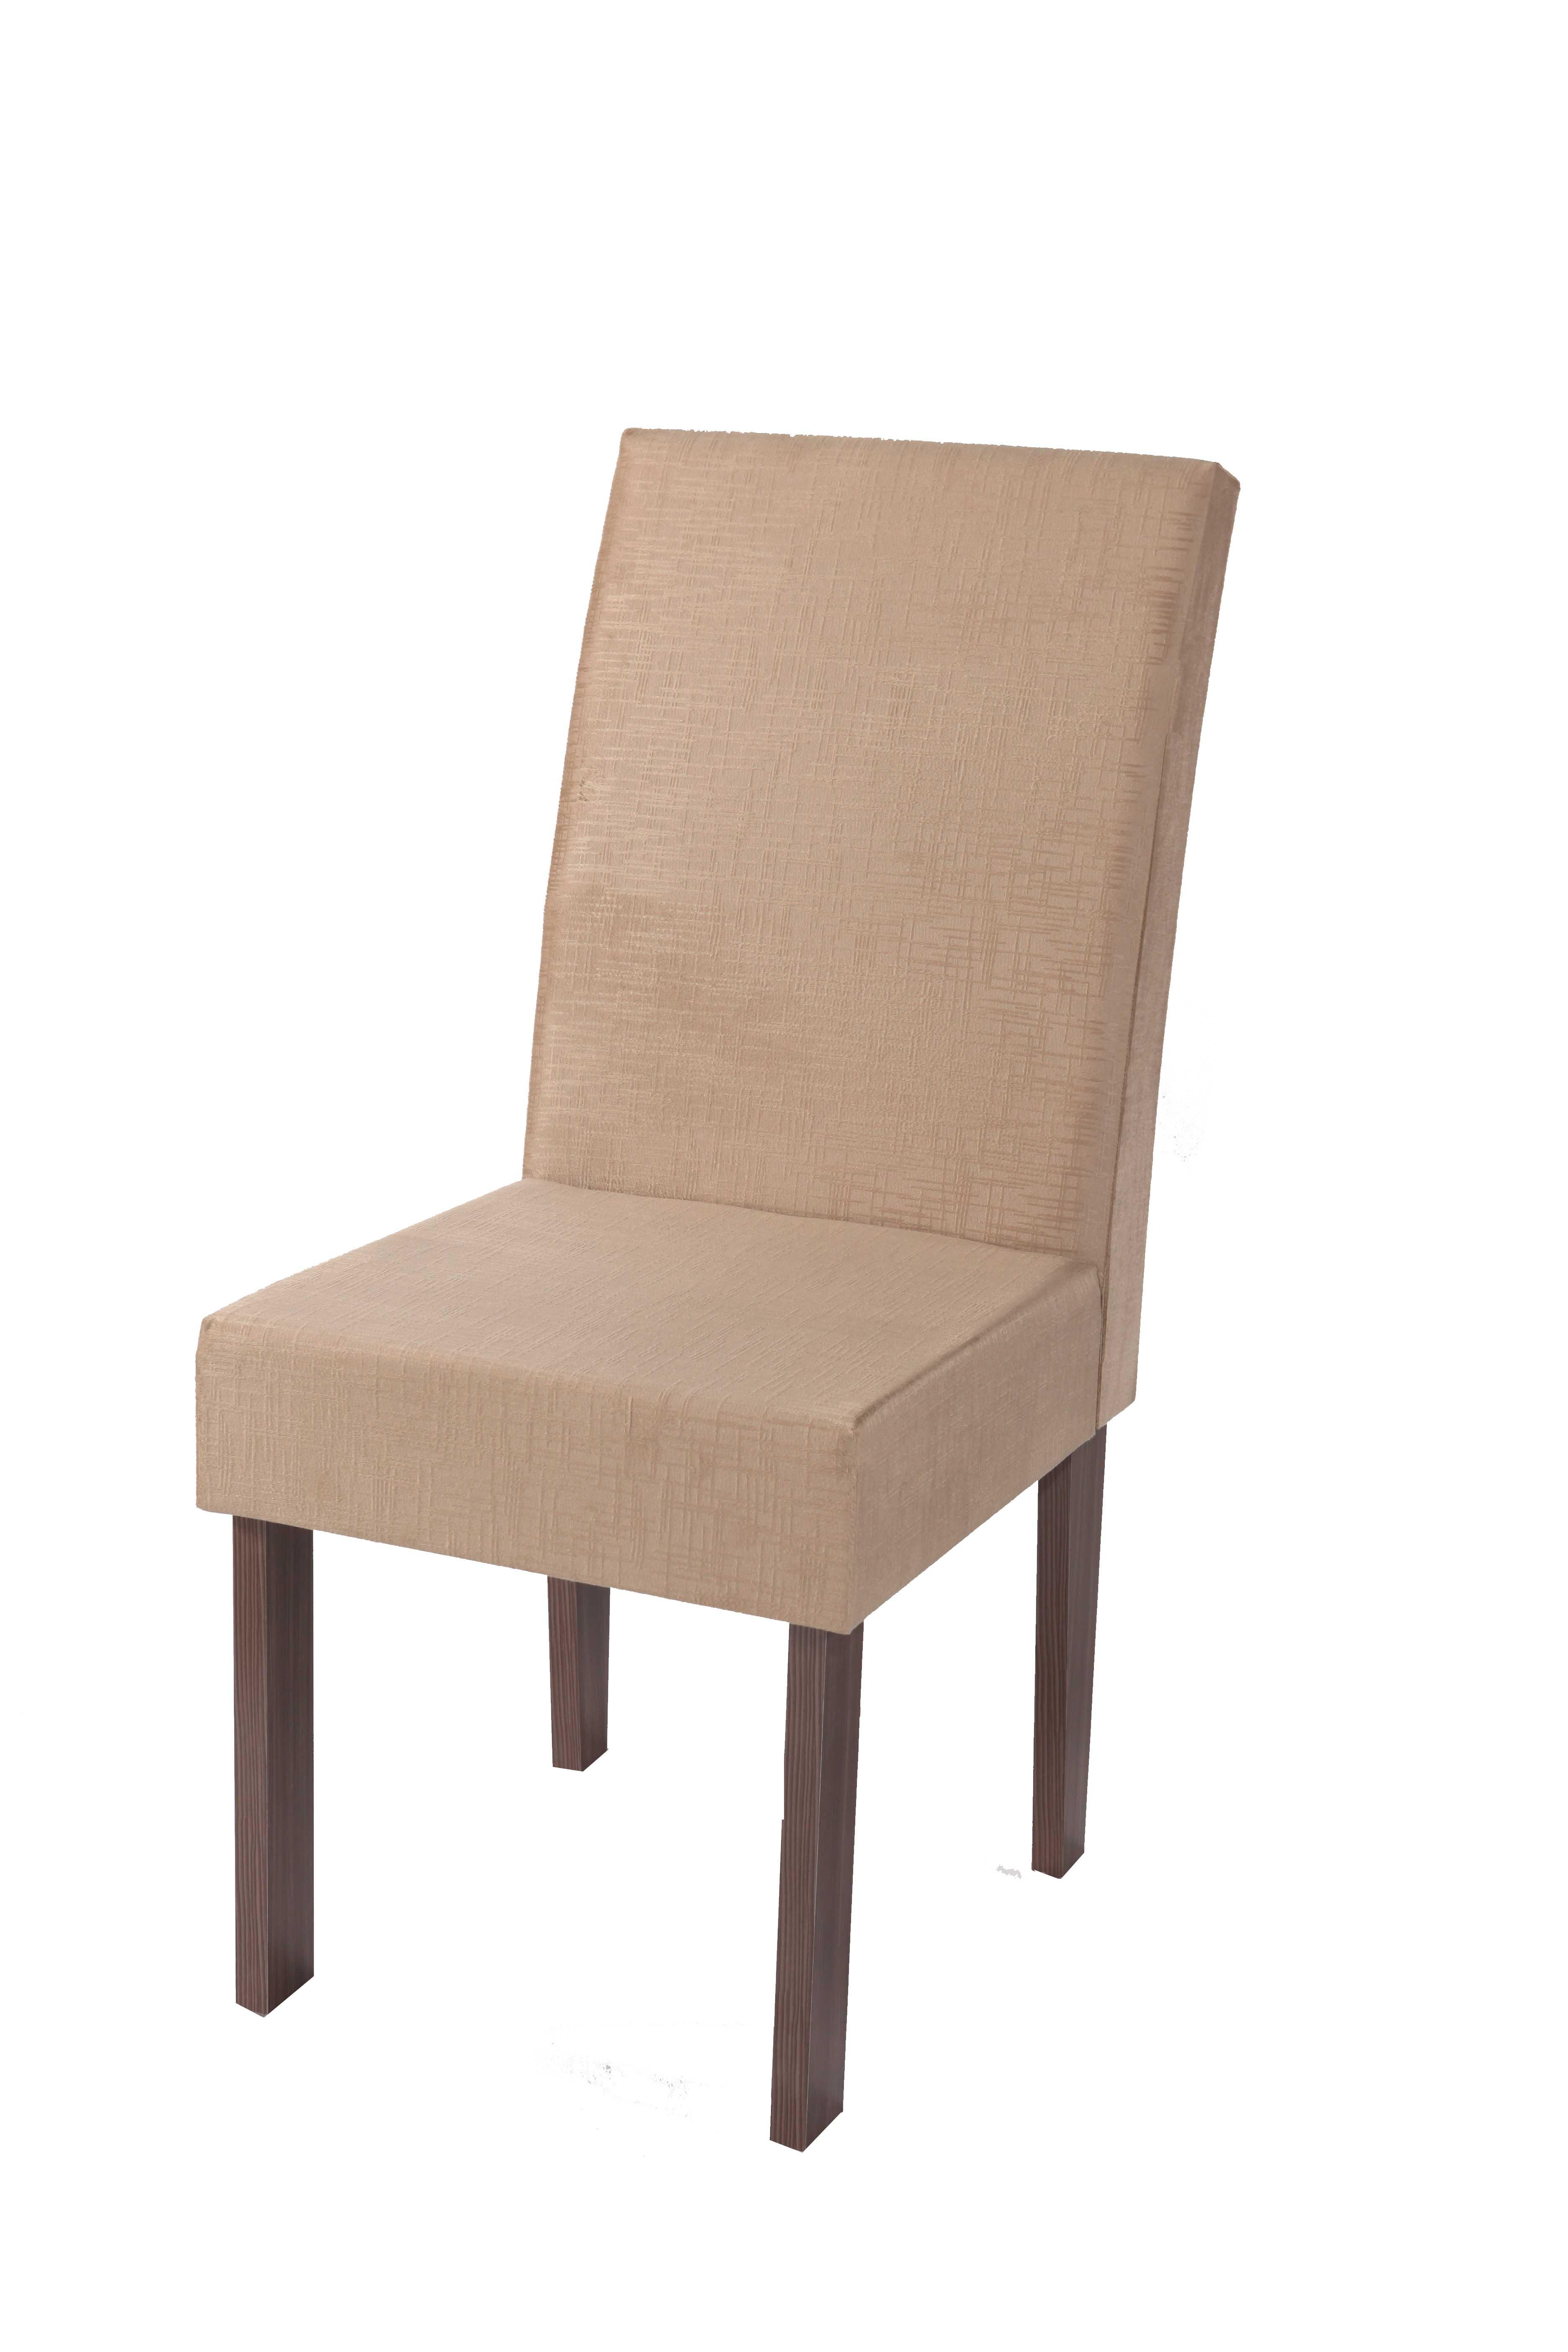 Cadeira_Cristal__Ebano_Fosco_-___Veloart_Bege